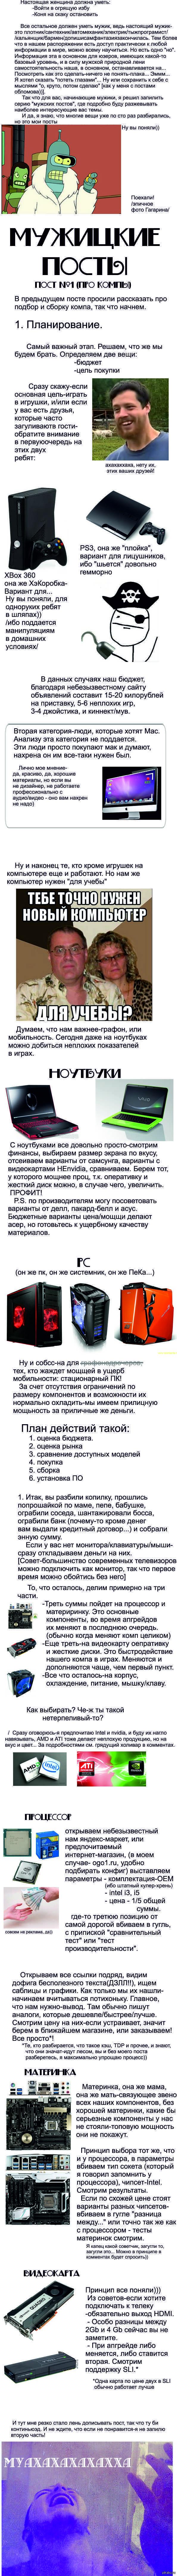 Мужицкий пост №1 Про сборку компа, ДЗЛЛ!